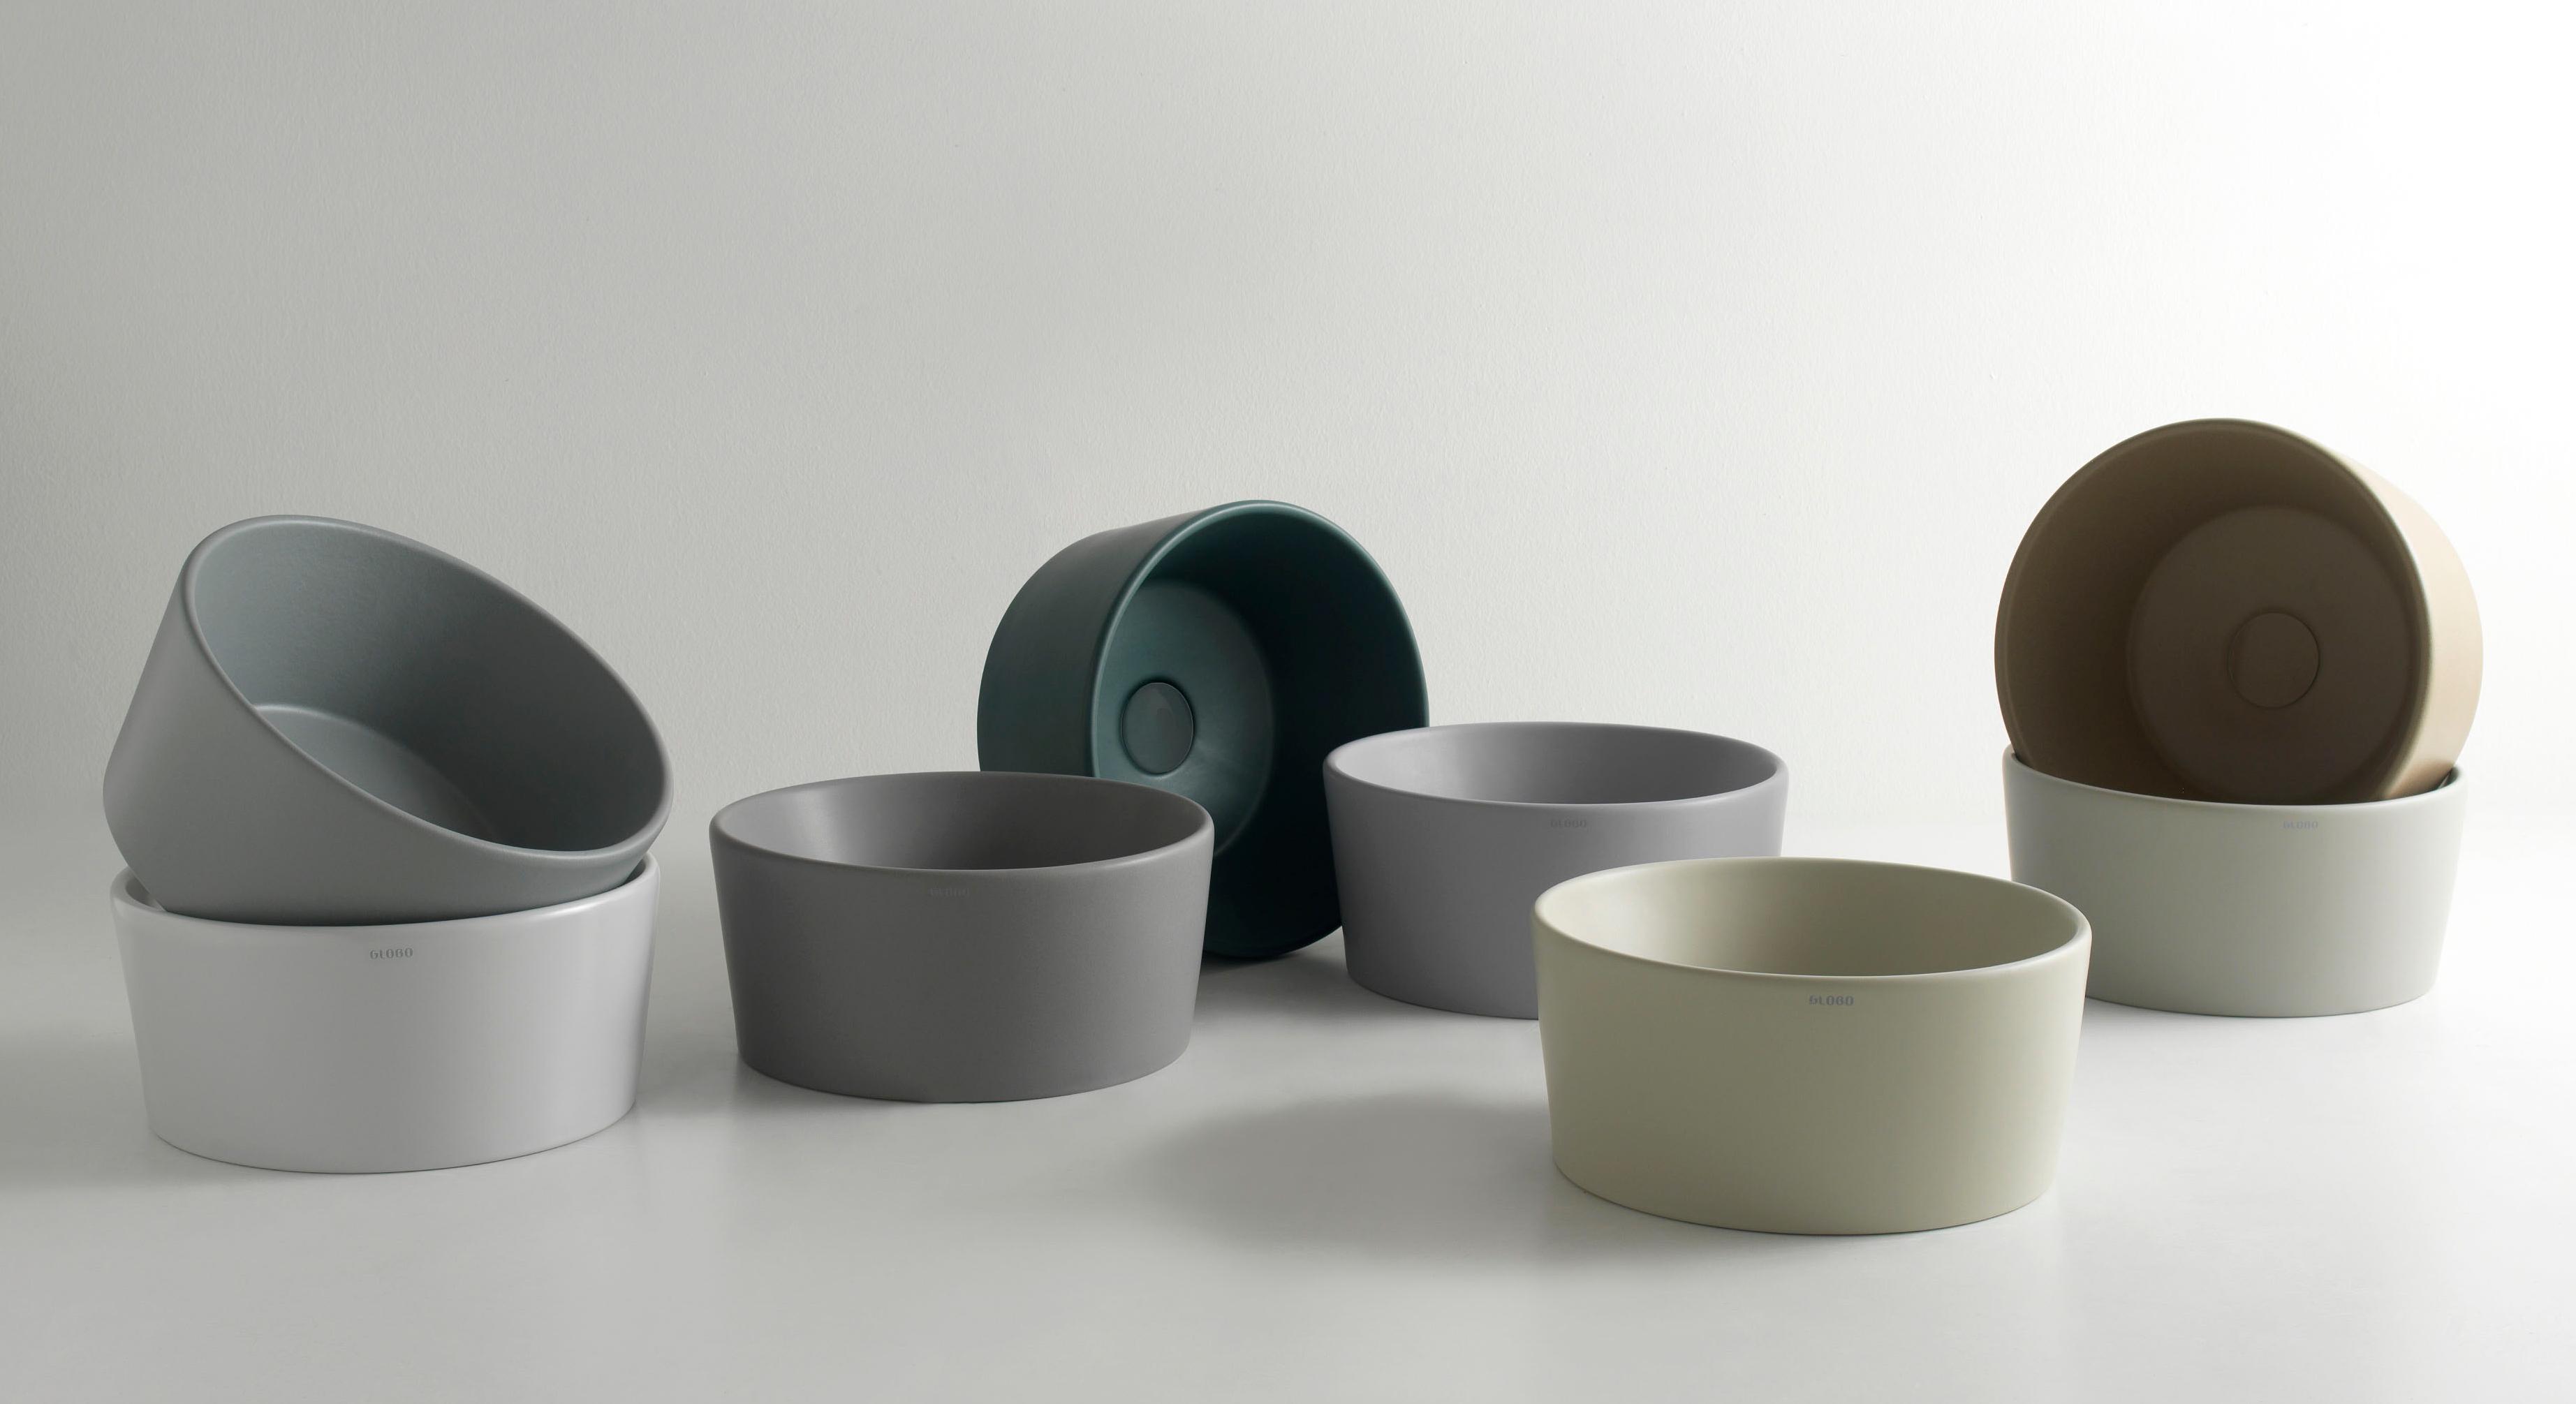 Globo Waschbecken the newest washbasin design at the ish 2017 stylepark